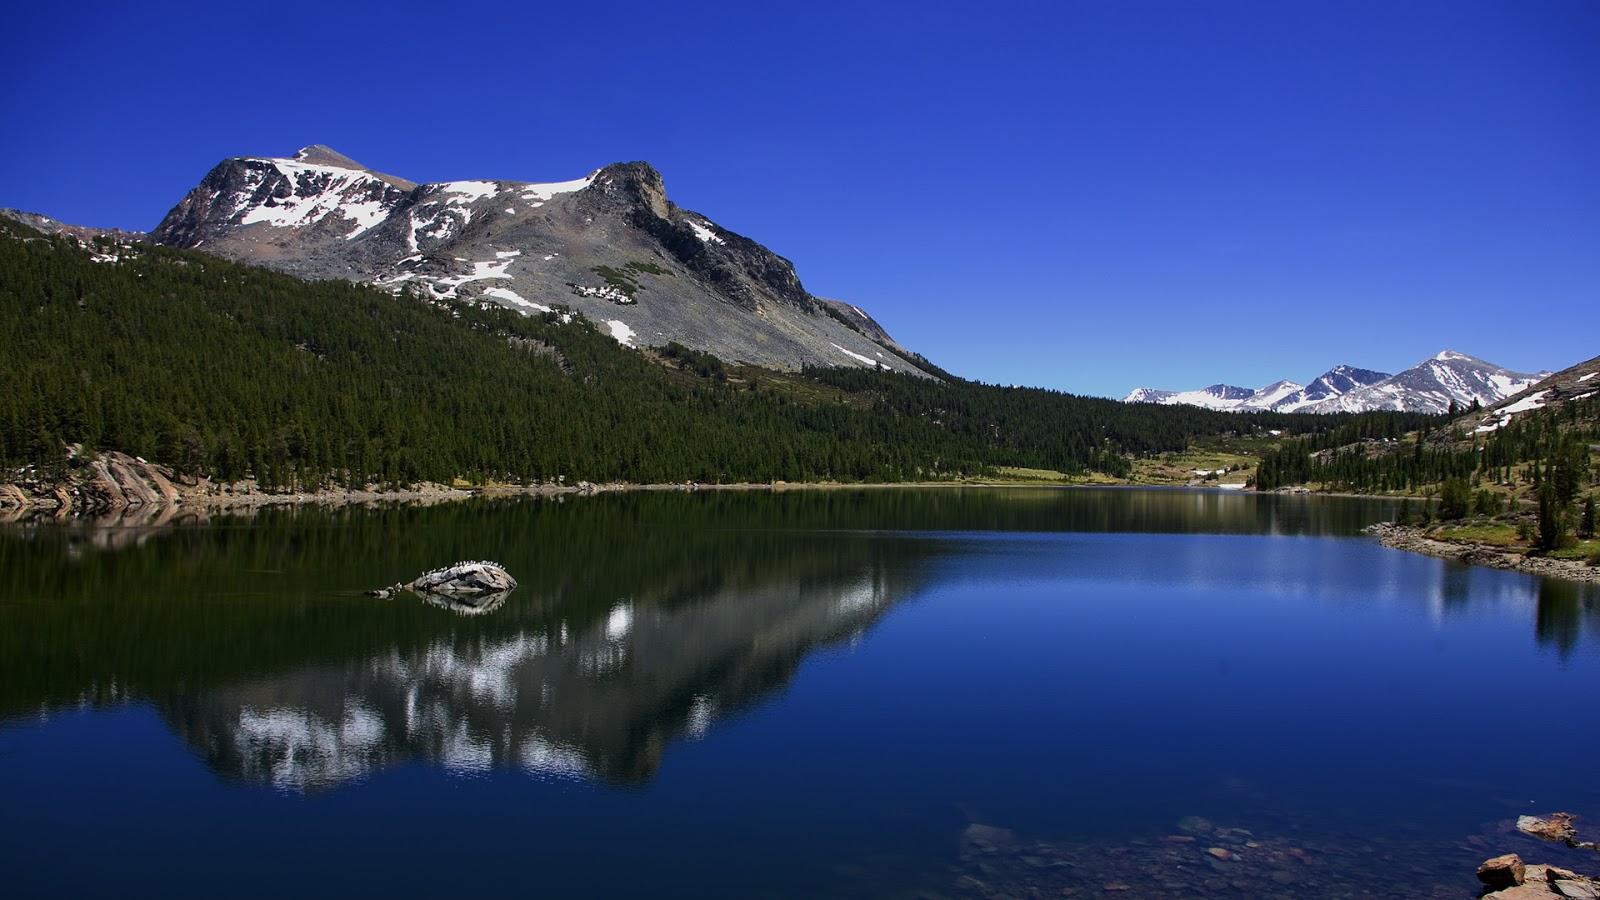 http://1.bp.blogspot.com/_v5h2qxDB1io/TQUQoWihcVI/AAAAAAAAA5A/5Pr7vrc4AnM/s1600/01319_glaciercanyon_1920x1080.jpg